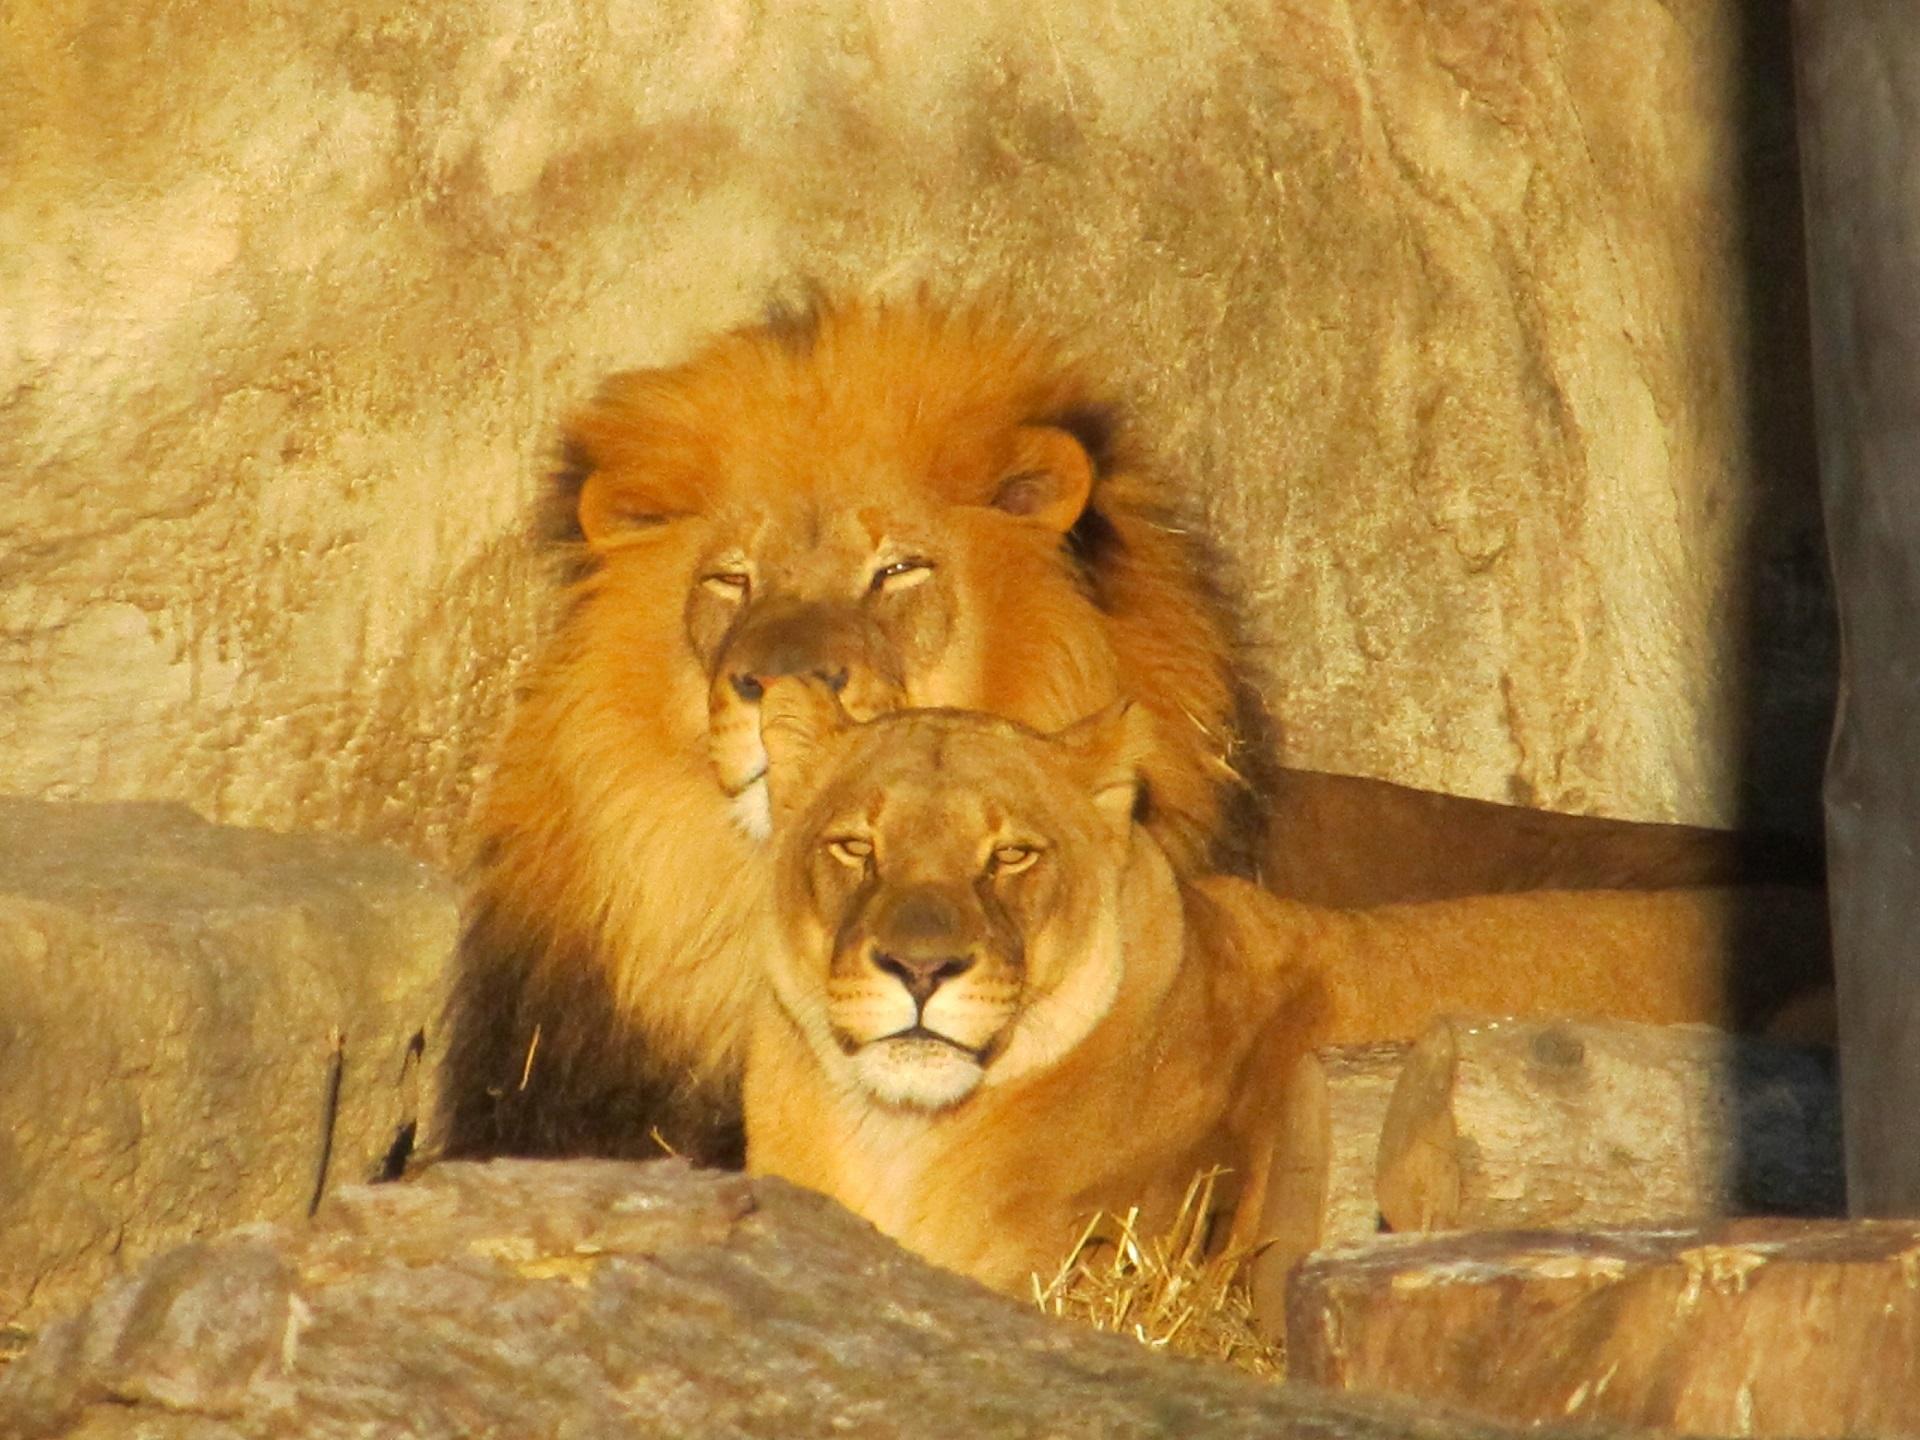 Lion Family, Animal, Family, Jungle, Lion, HQ Photo